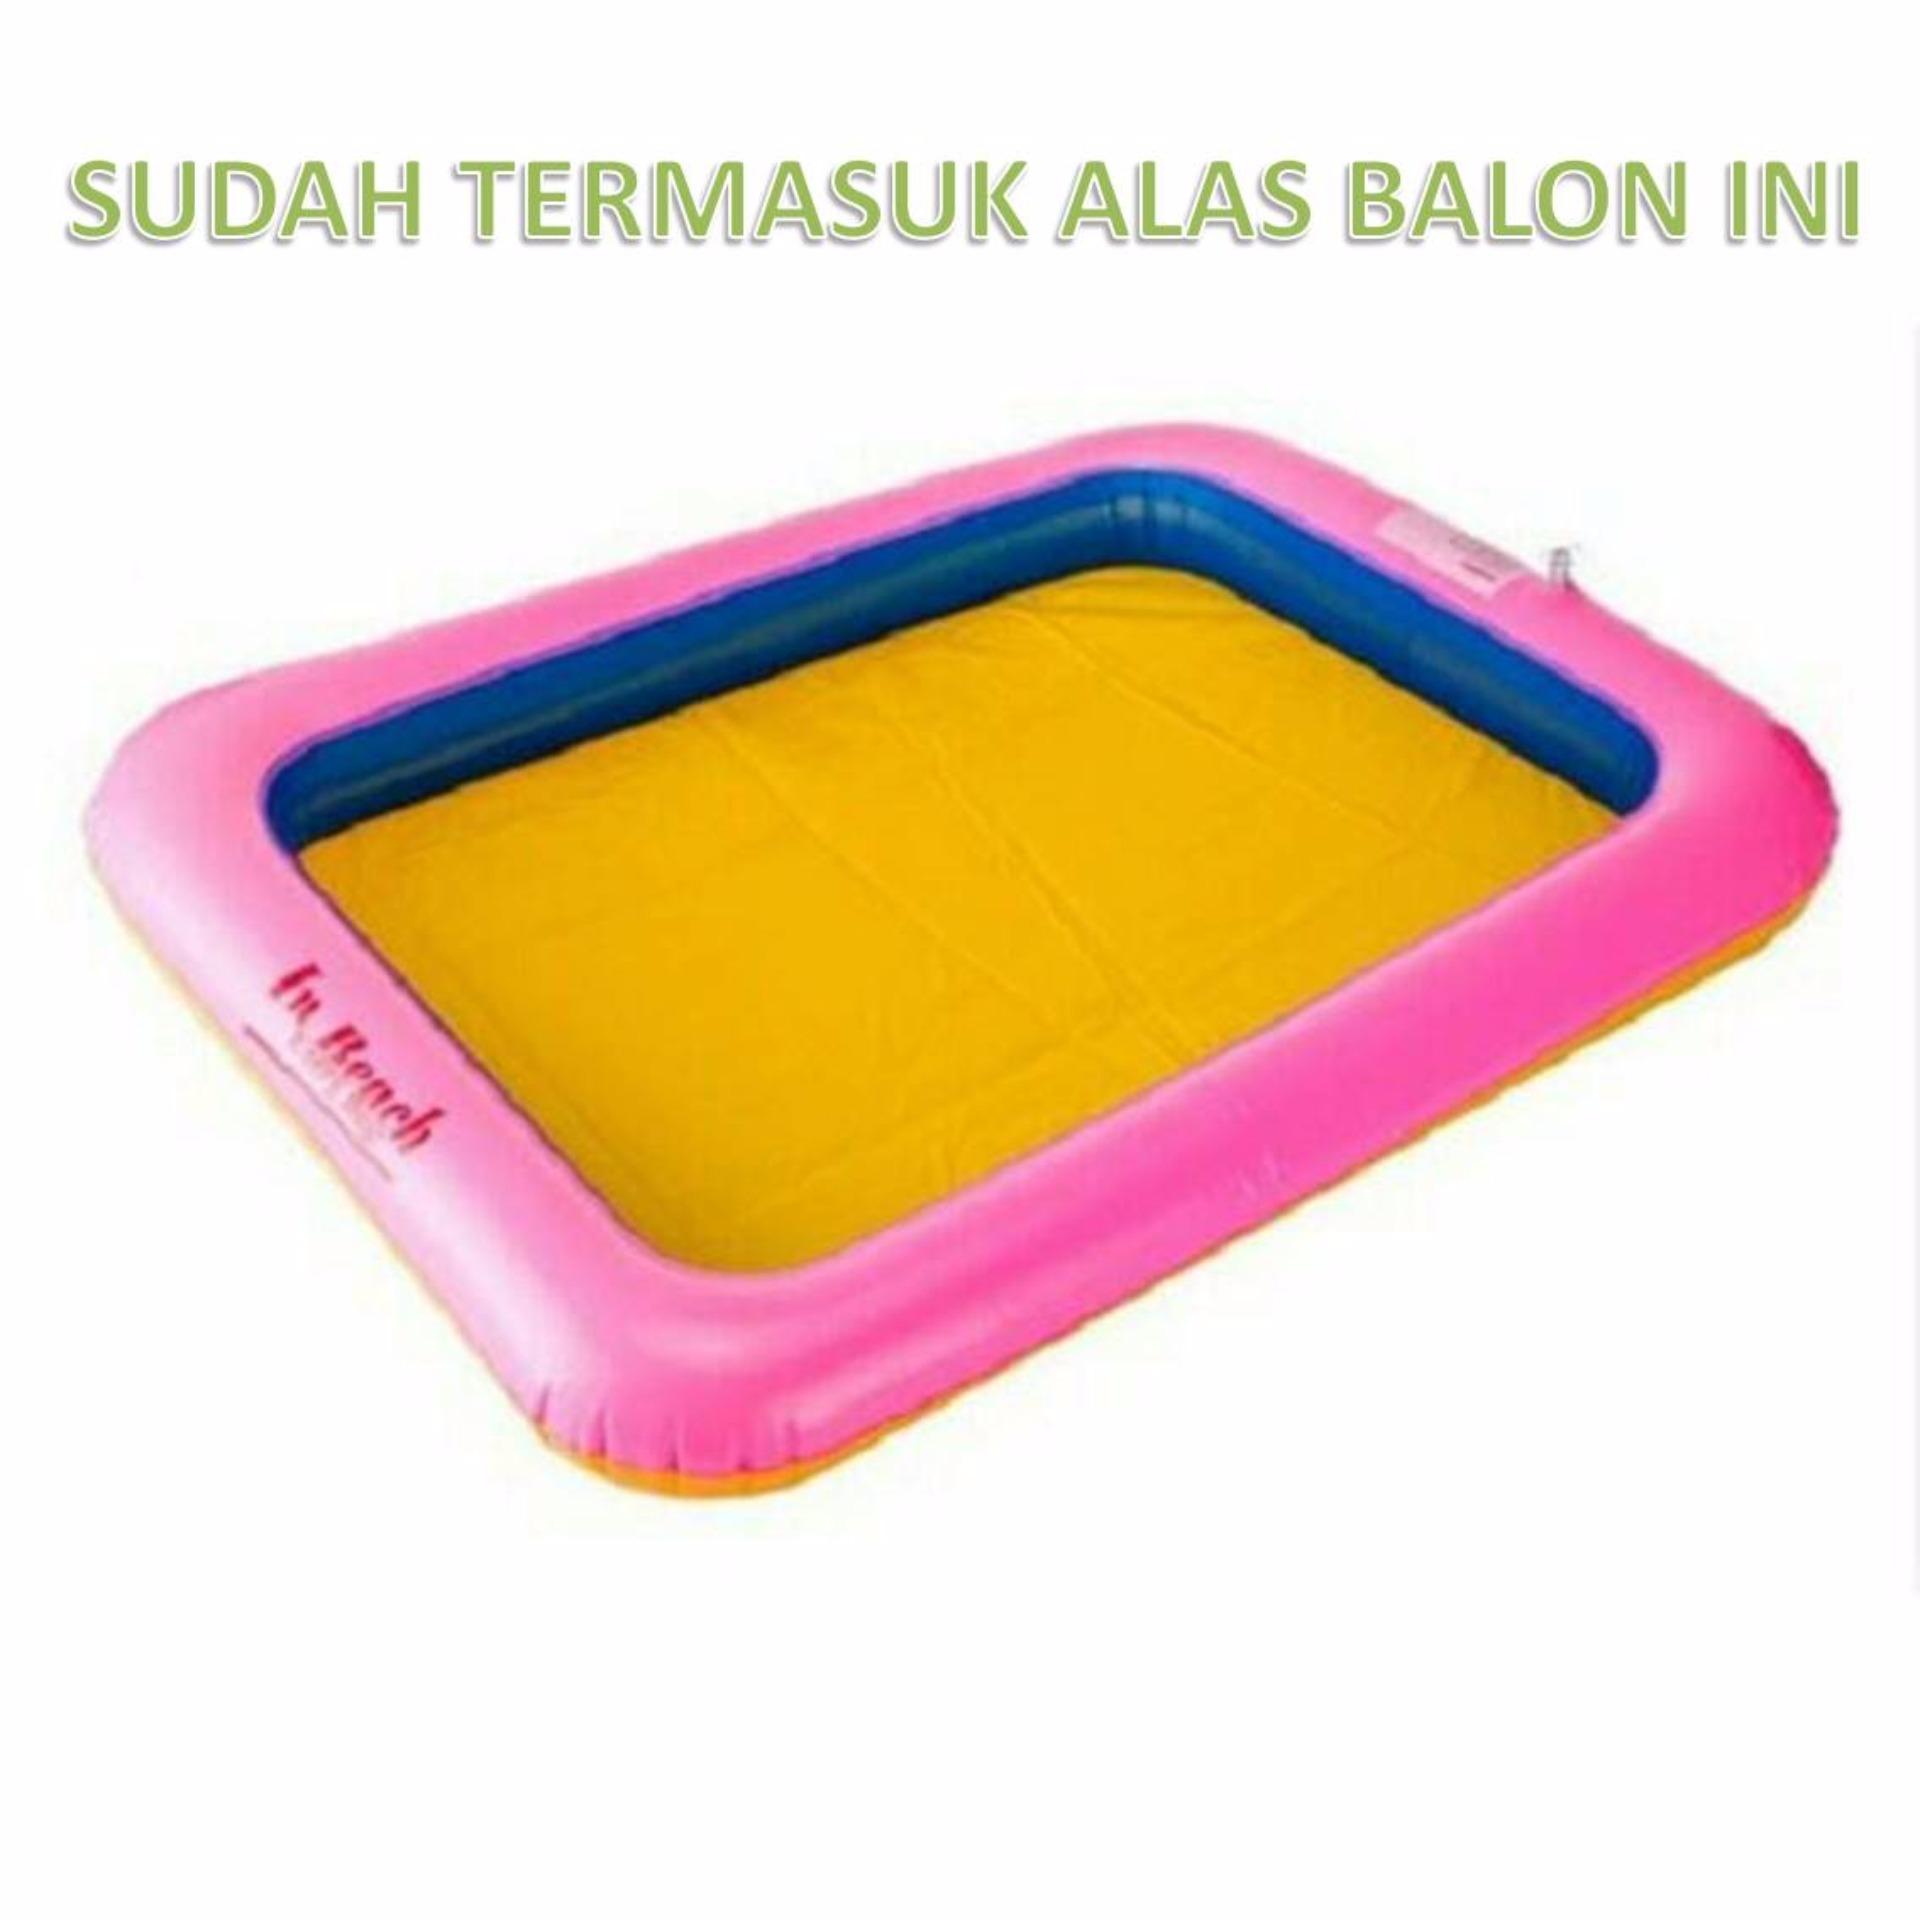 Perbandingan Harga Mainan Pasir Ajaib Kinetik Play Sand Magic Balon Modeling 600gr Dengan Animal Kingdom Dan Alas